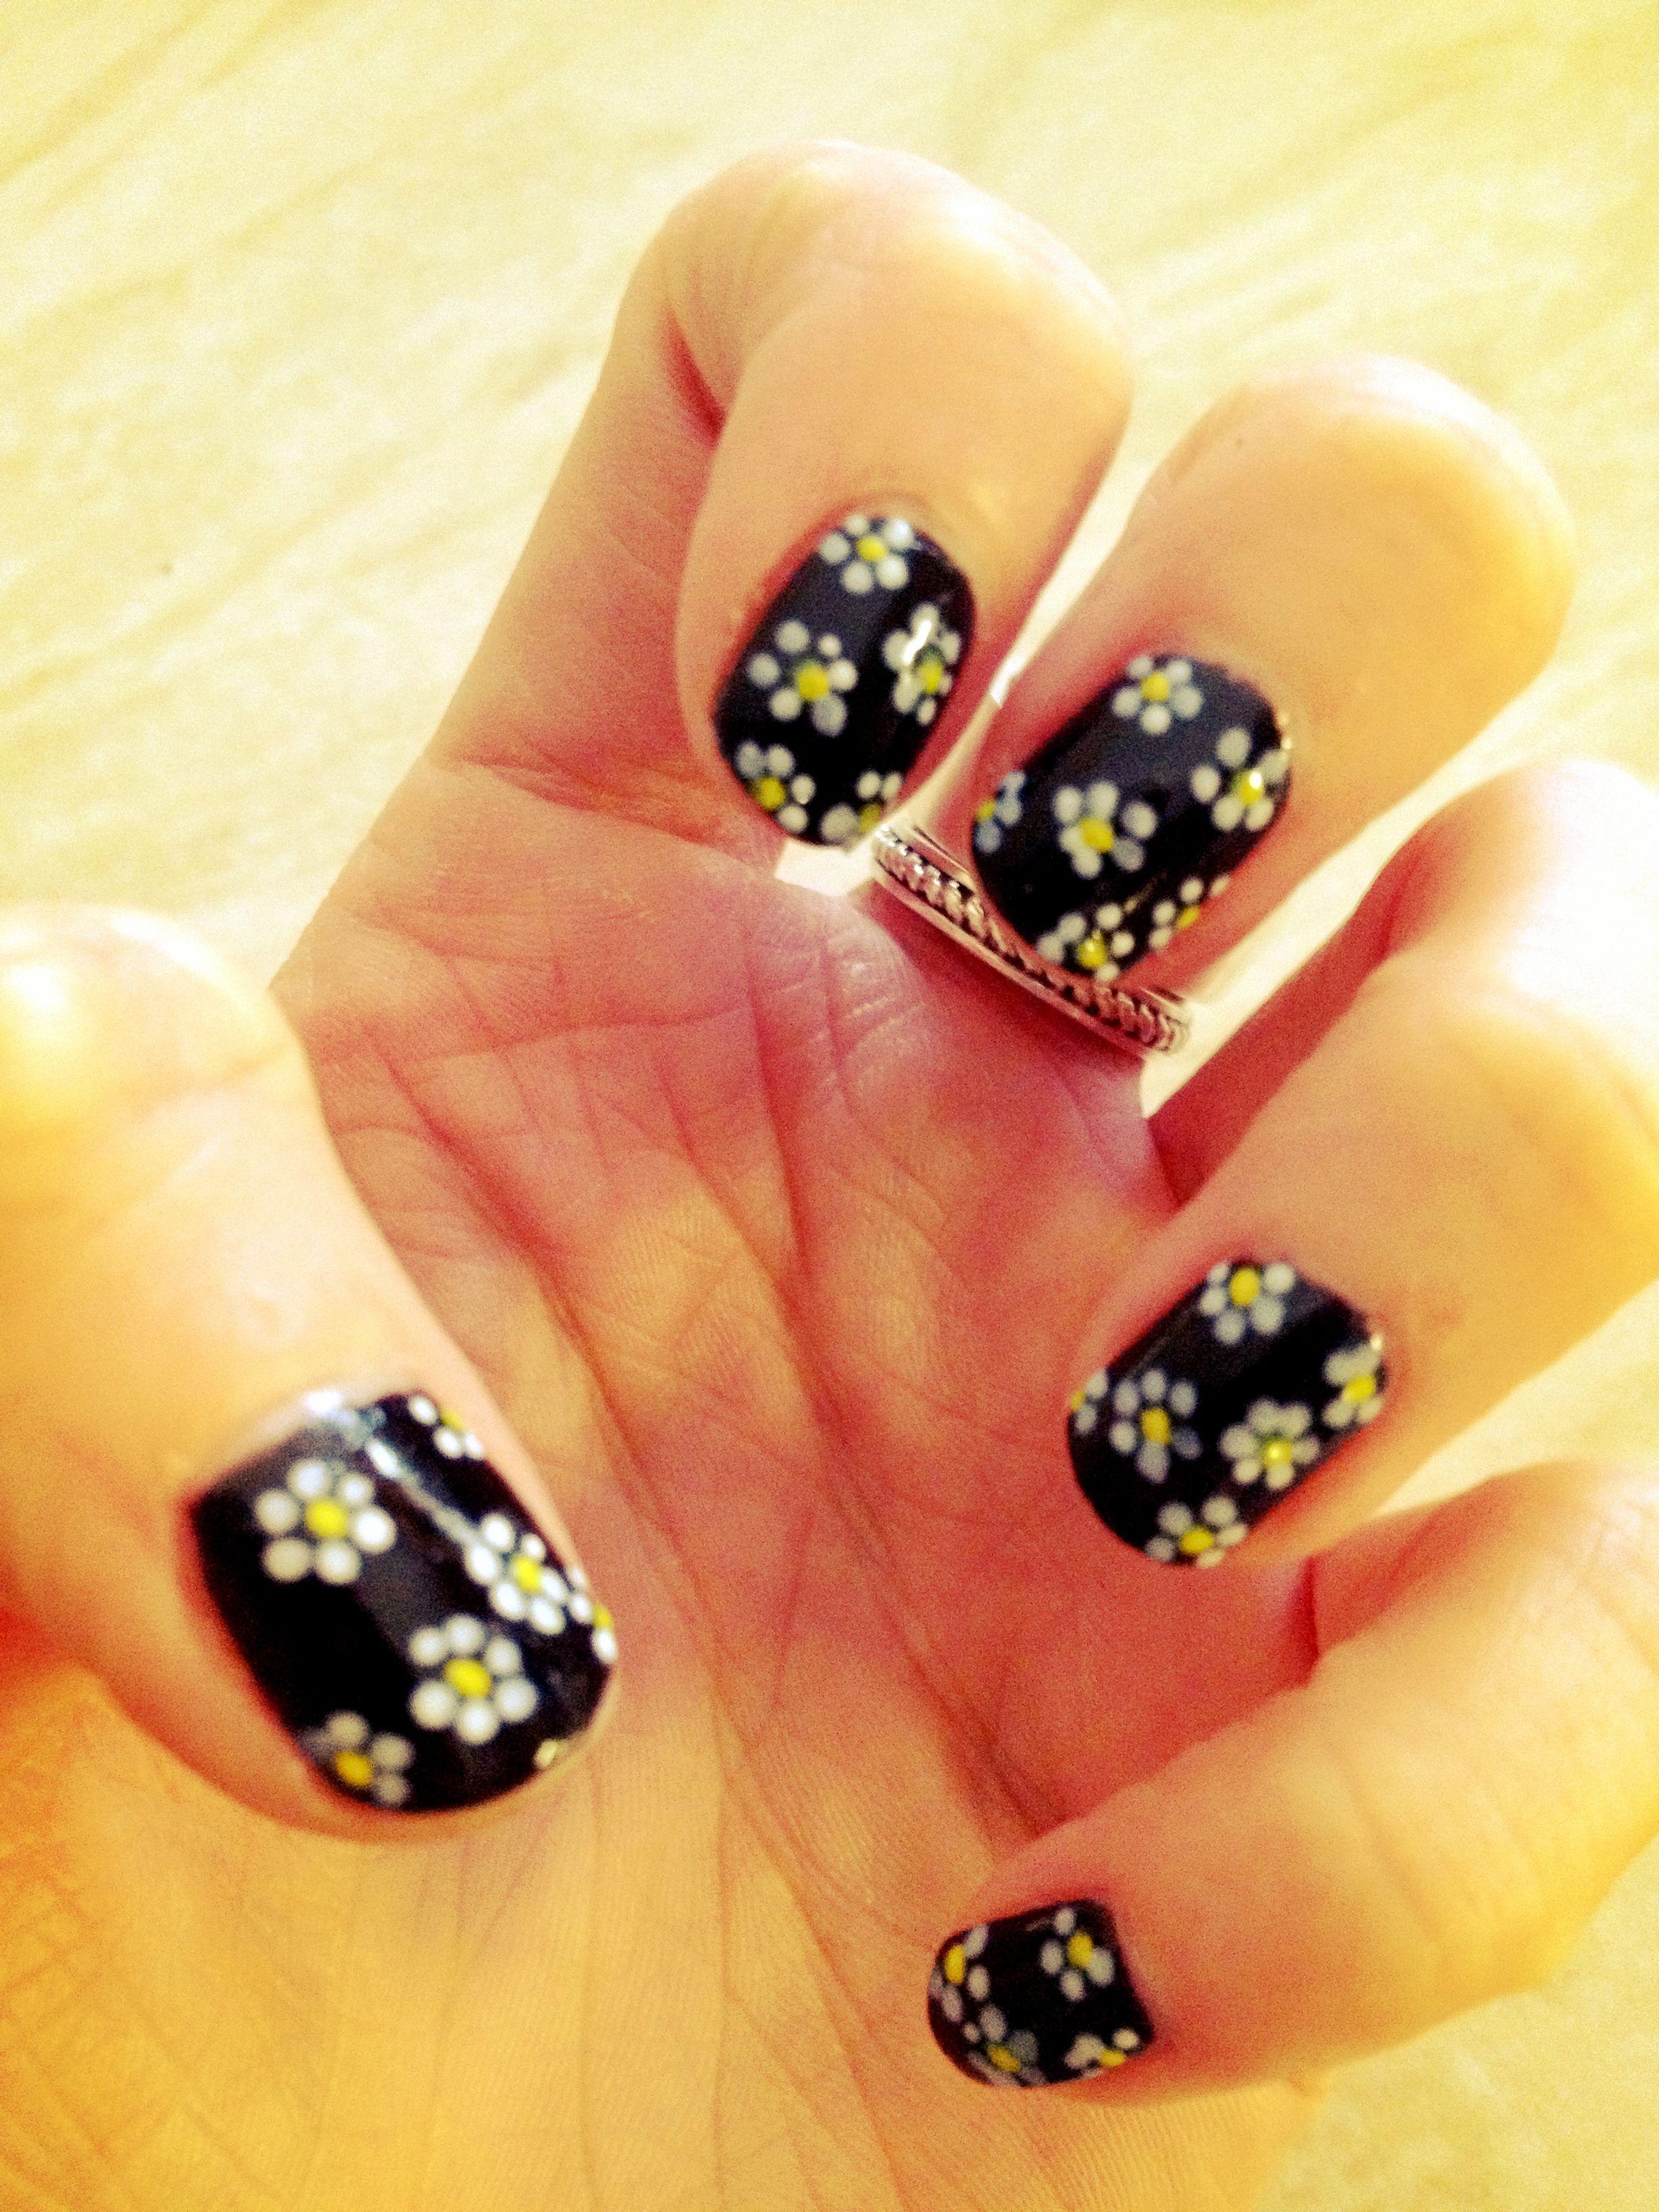 Daisy Flowers Nail Art Using White And Yellow Nail Art Pens Nail